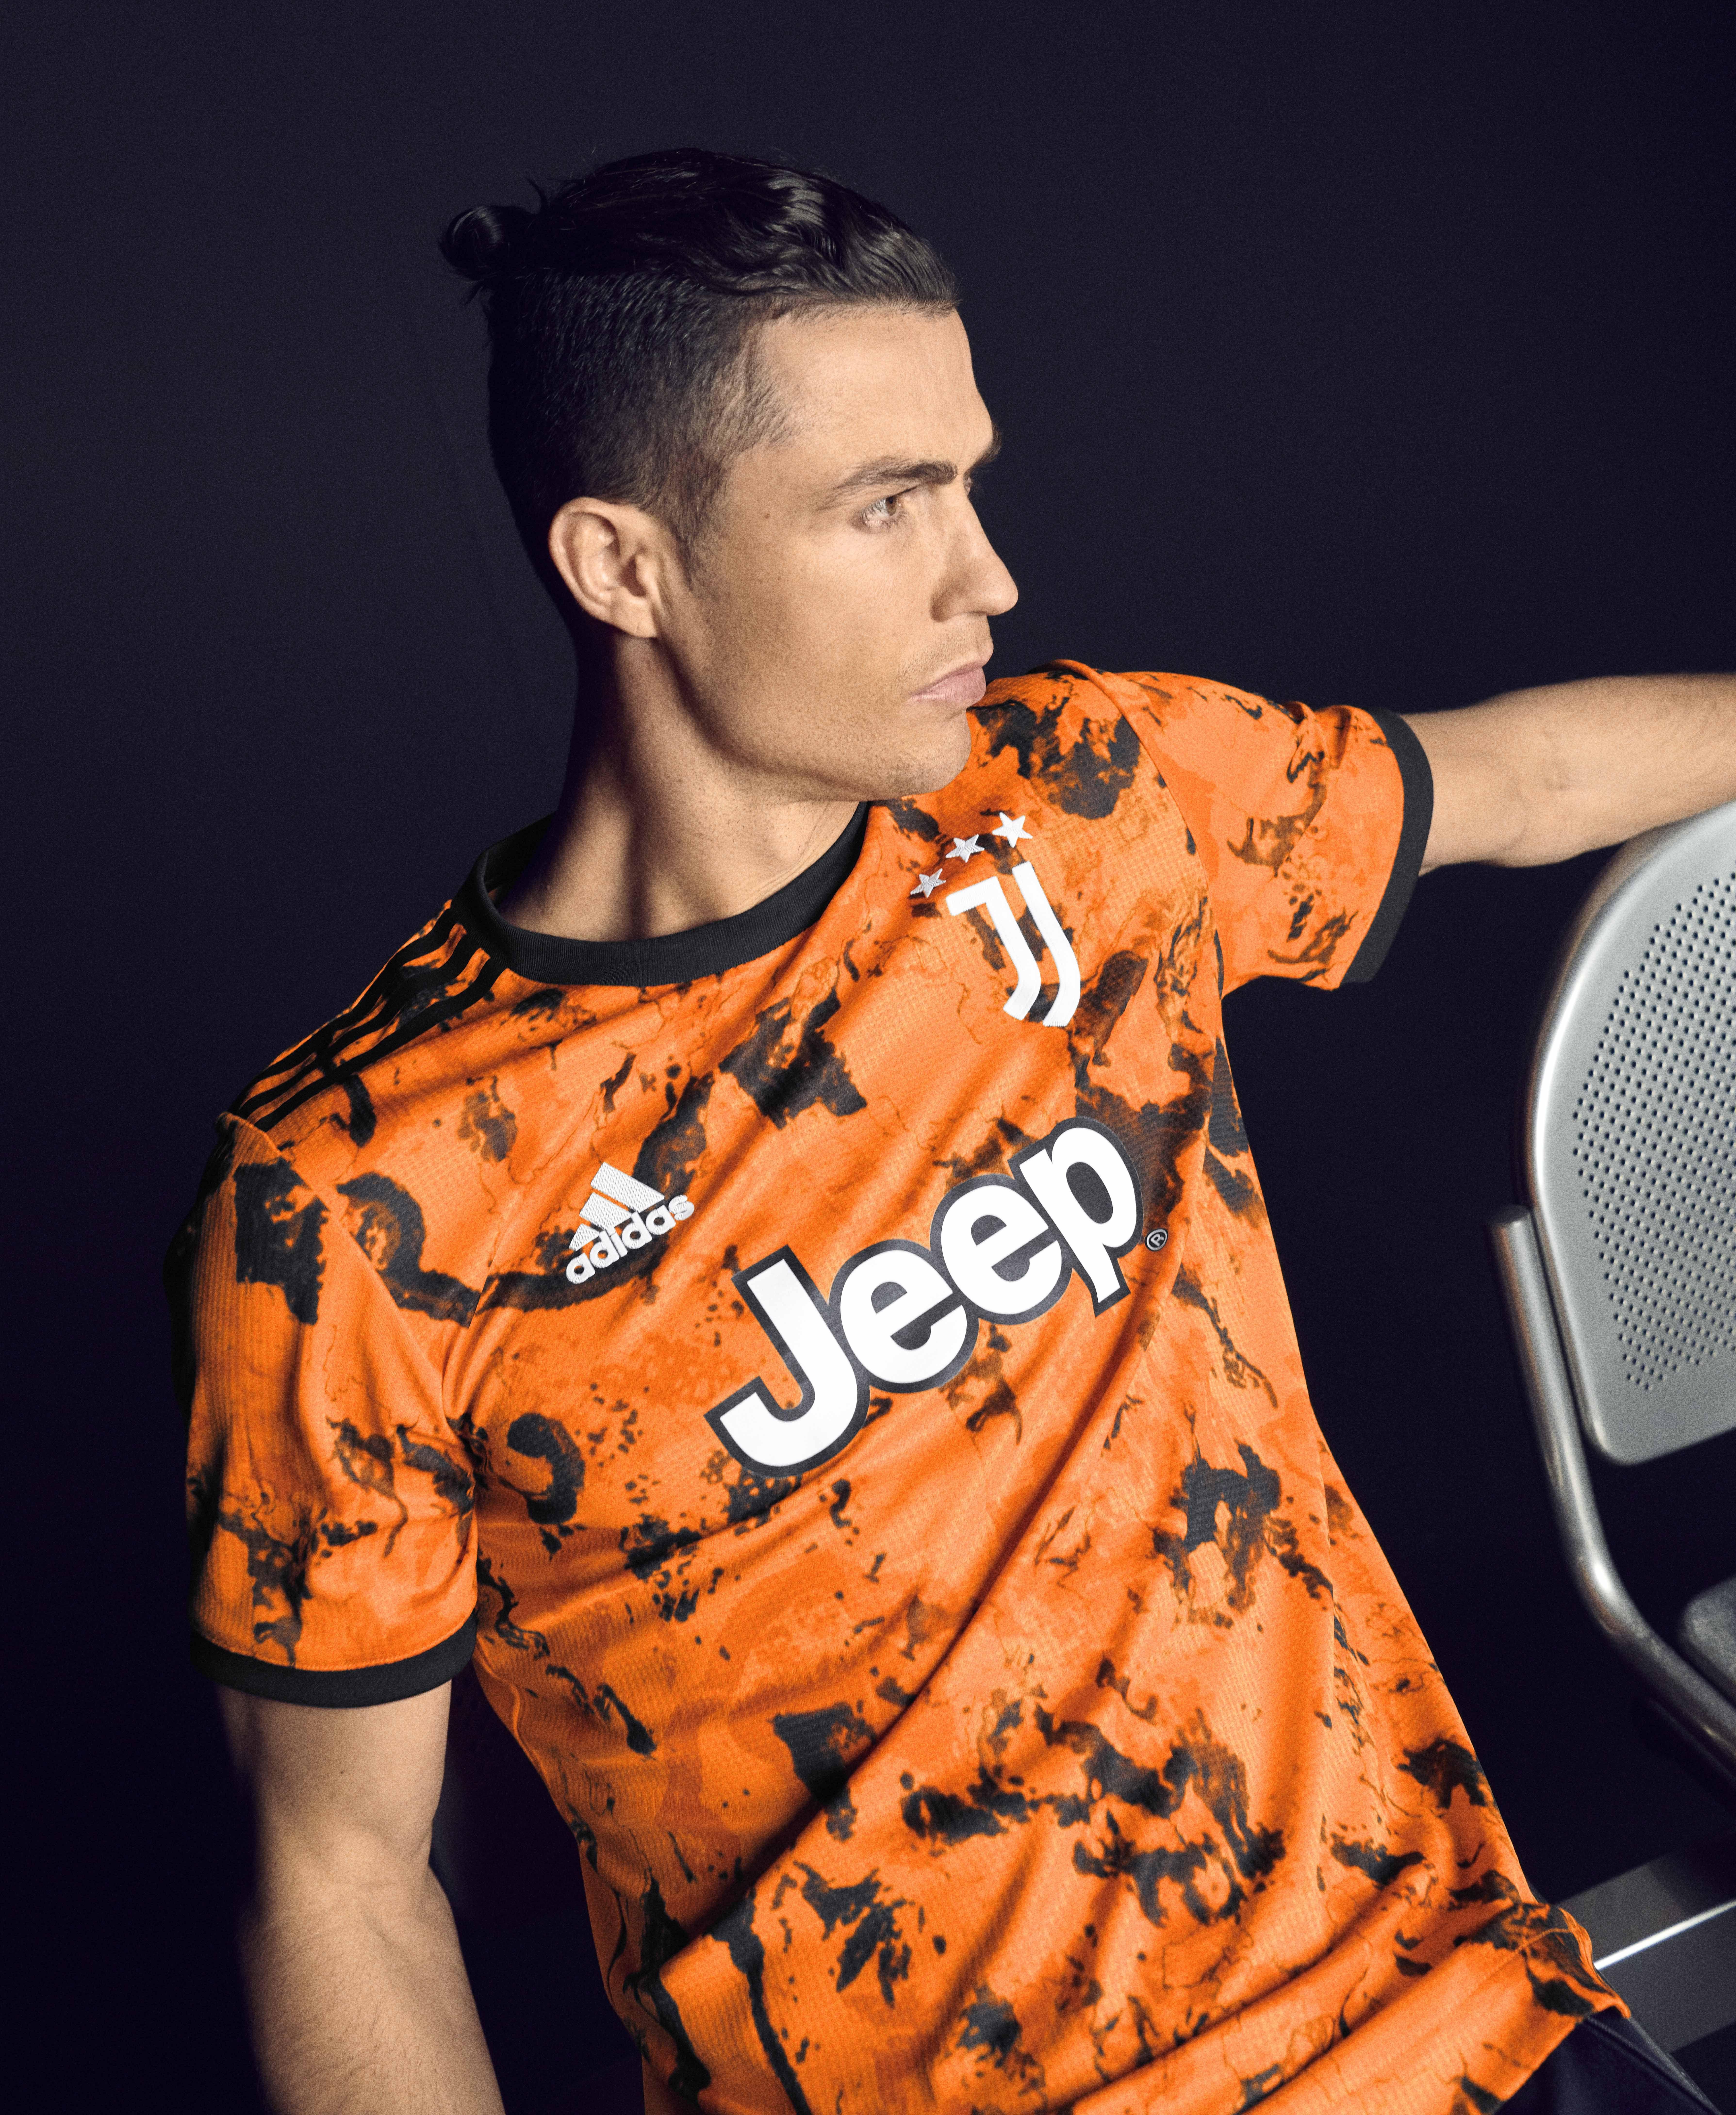 Juventus 20/21 Third Jersey | Cristiano ronaldo, Crstiano ronaldo ...